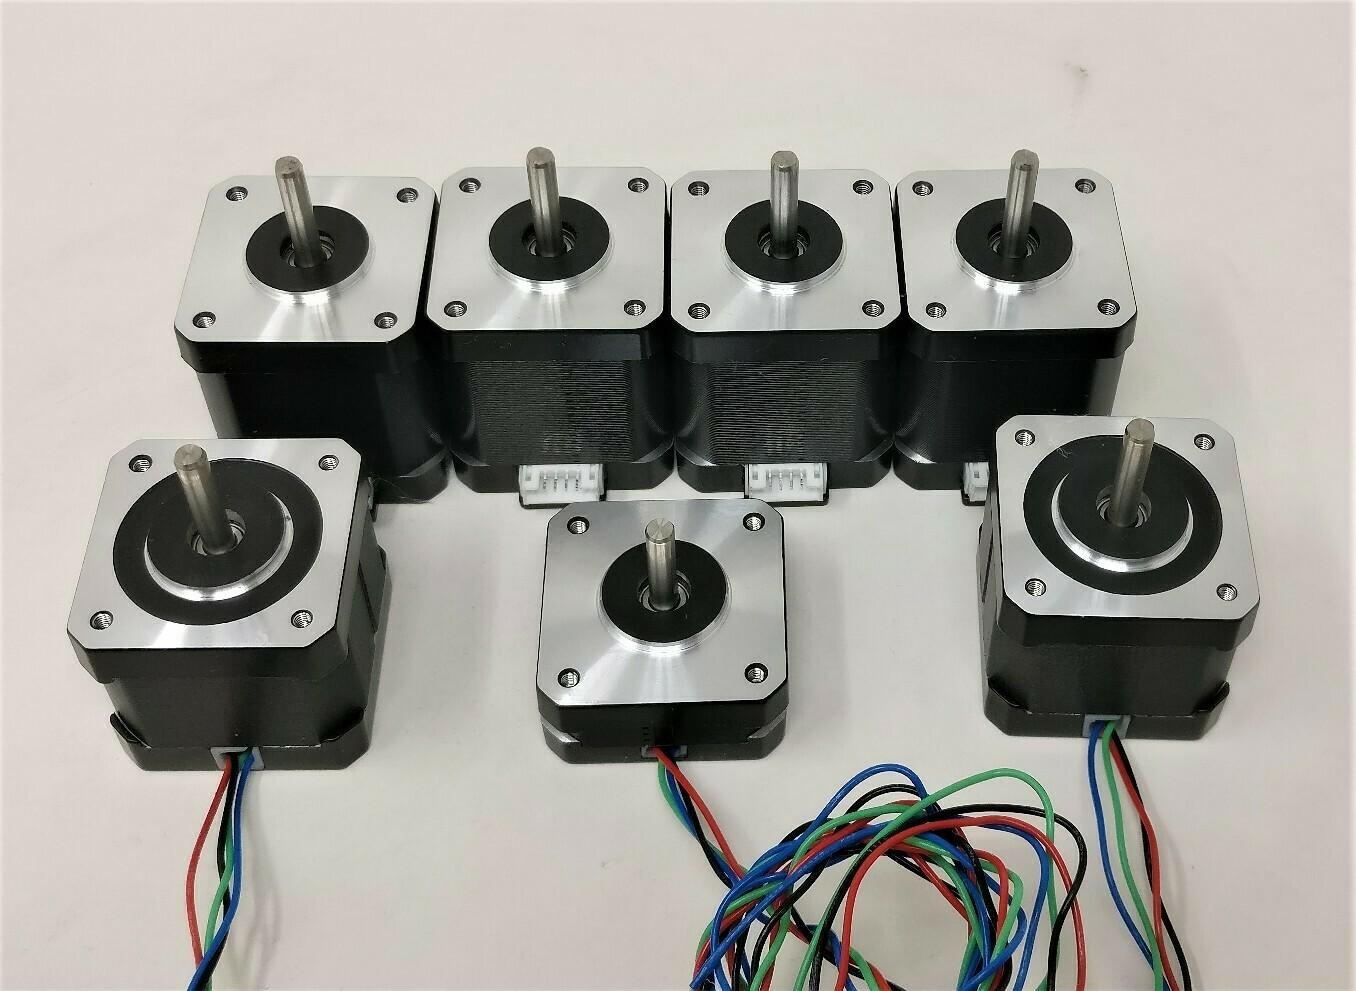 Voron 2.4 Motor Set